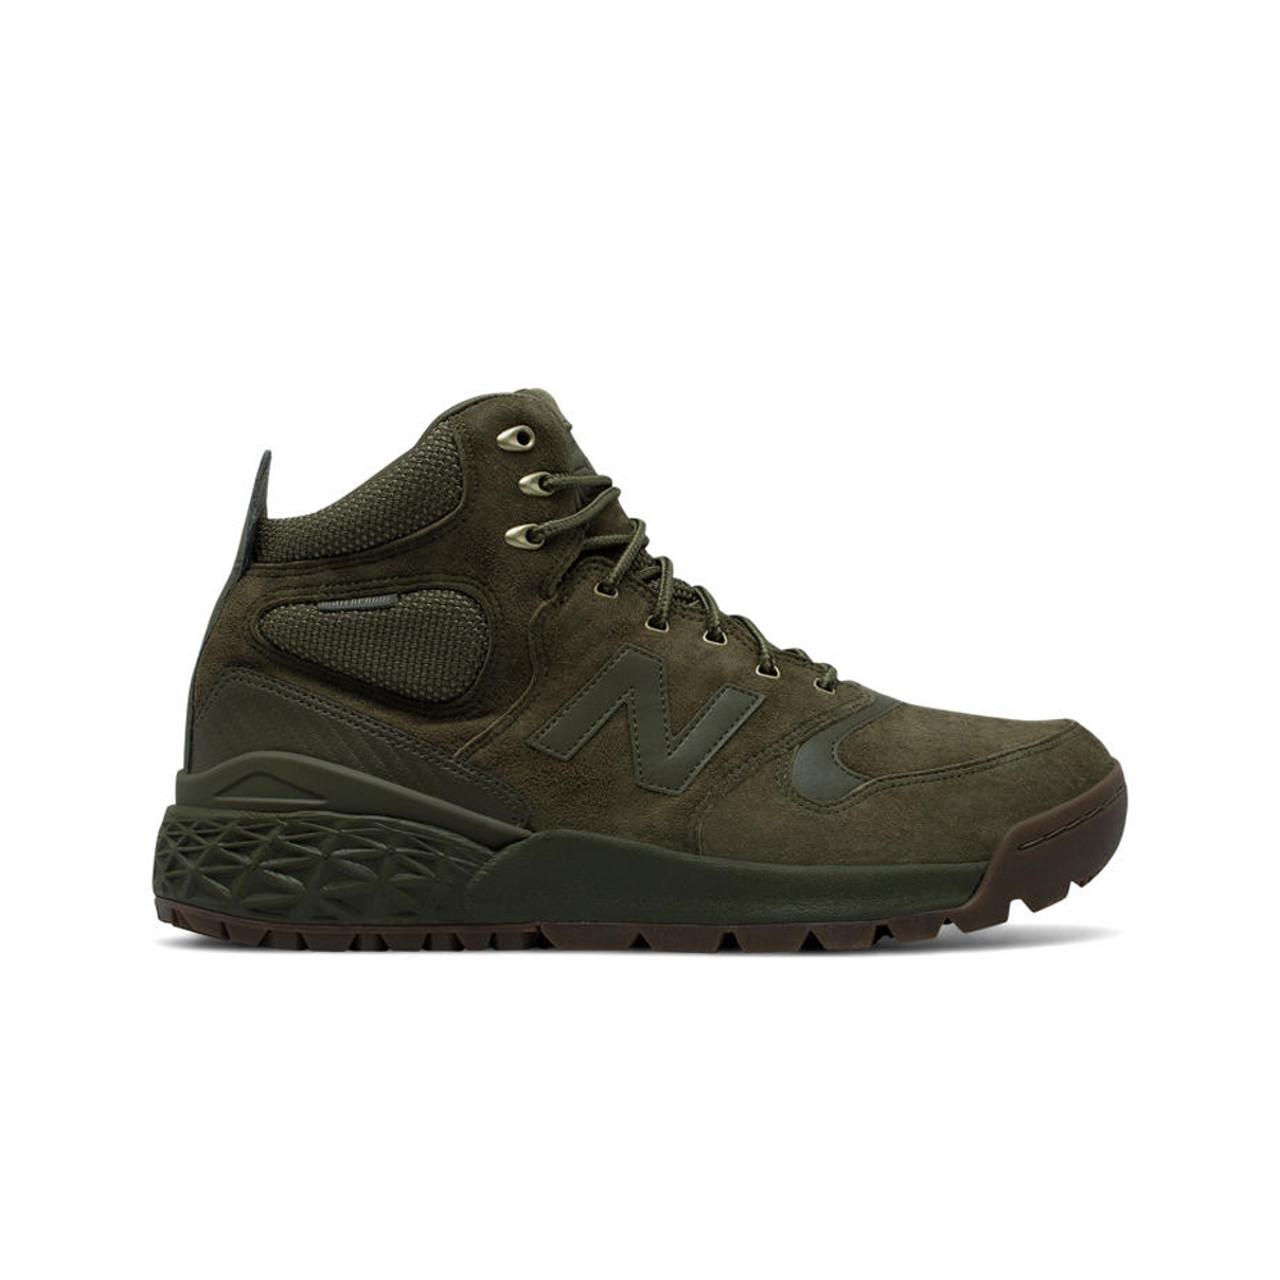 ad8d7b29a05 New Balance Men's HFLPXOL Sneaker Boot Olive